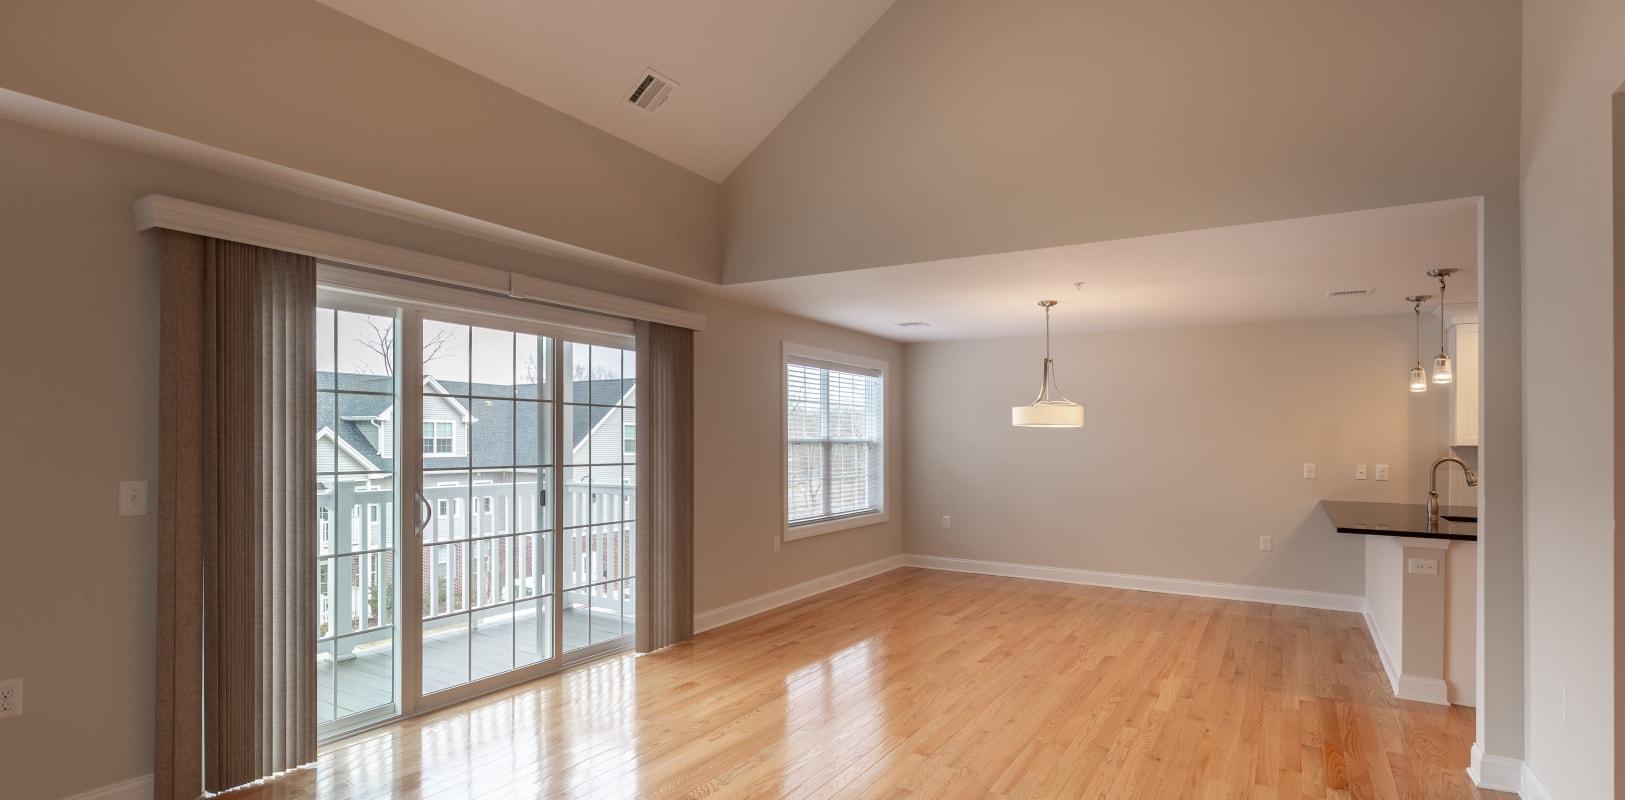 Very spacious living room with hardwood floors at Zephyr Ridge in Cedar Grove, New Jersey